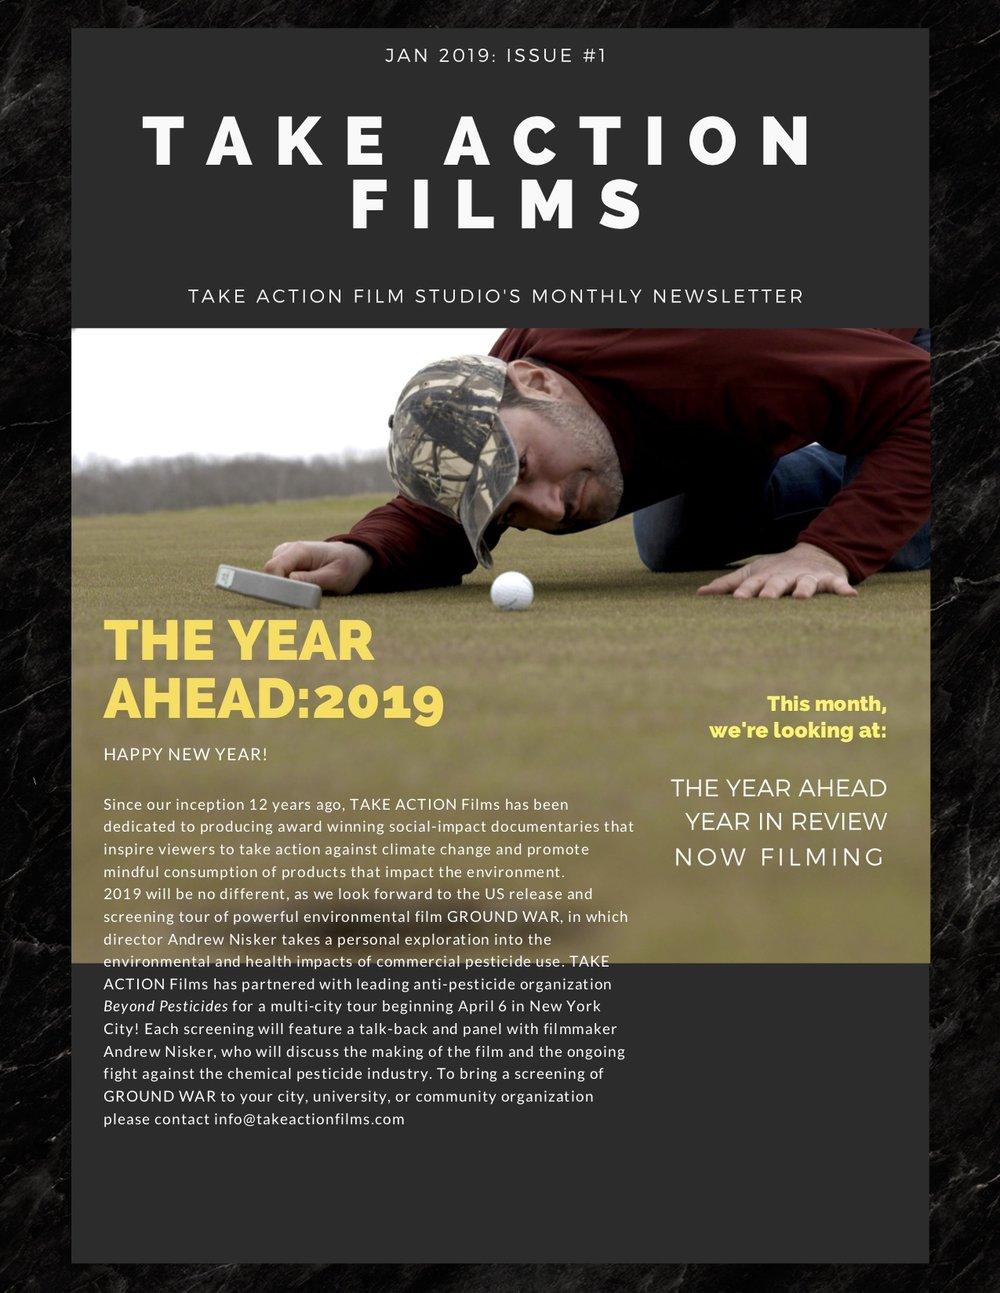 TAKE ACTION FILM Studio's Monthly Newsletter_VIVIONCO.jpg